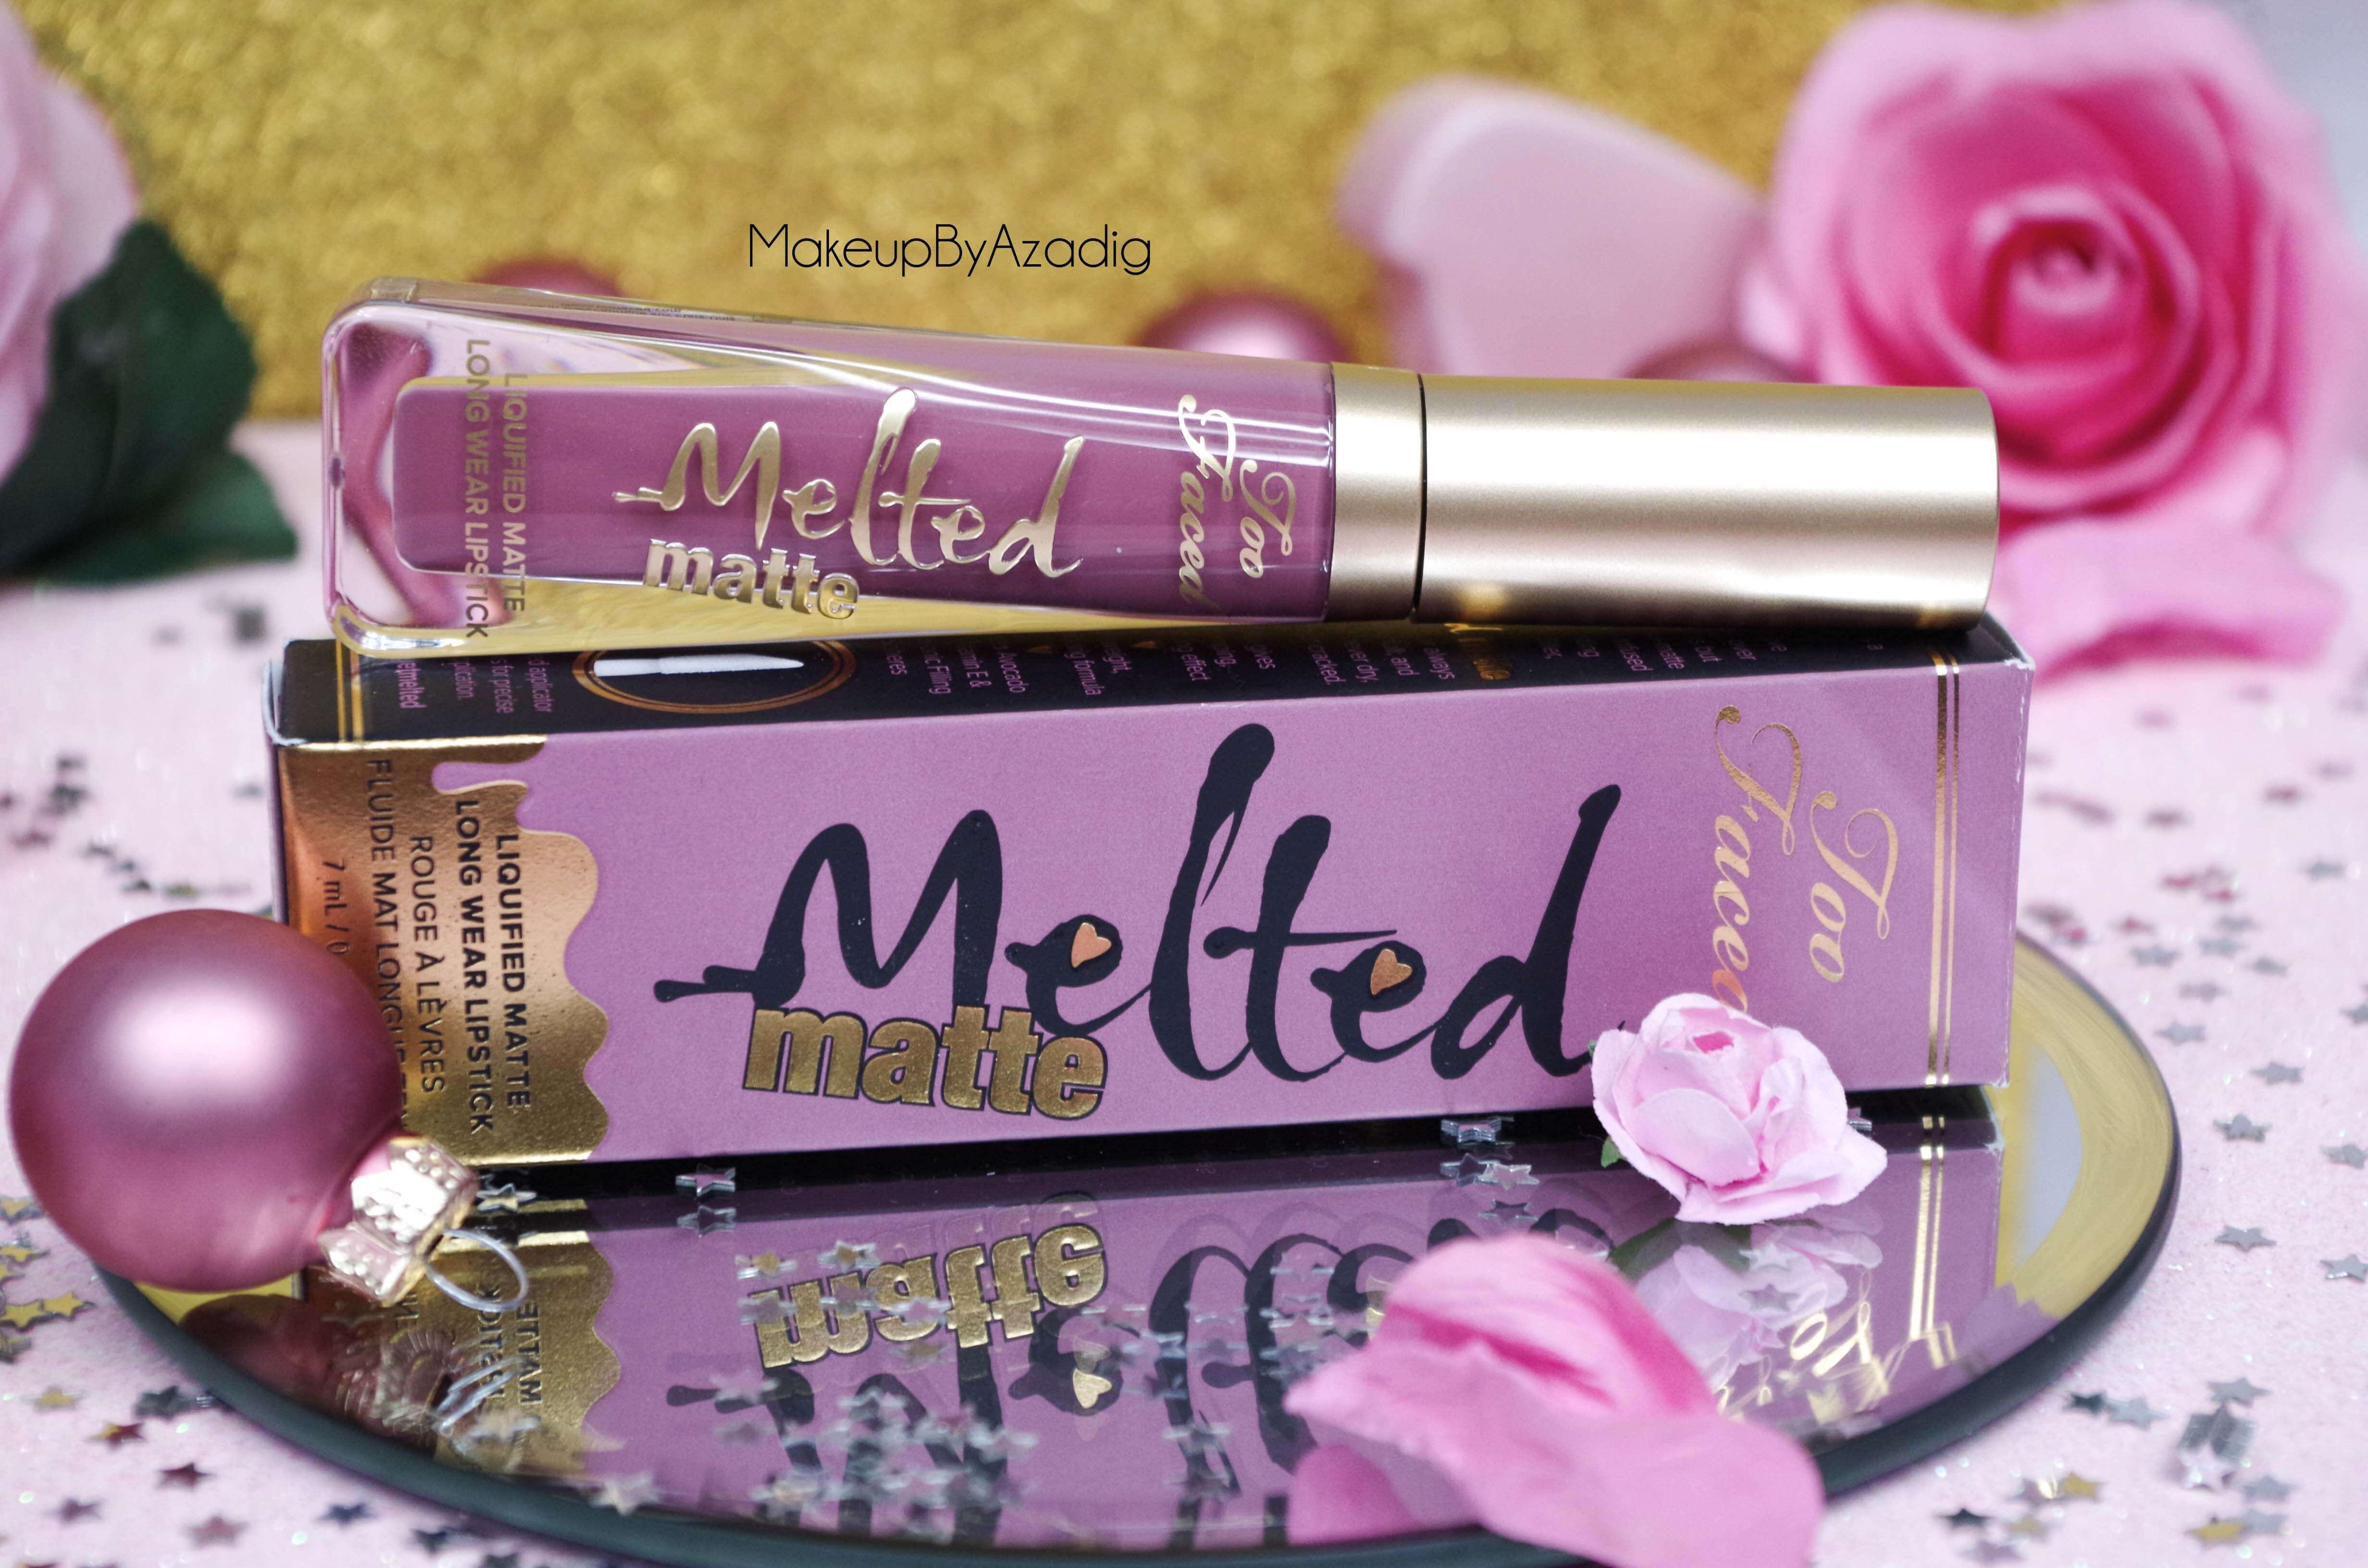 makeupbyazadig-melted-matte-queenb-bendandsnap-dropdeadred-too-faced-rouge-levres-revue-avis-prix-sephora-paris-blog-best